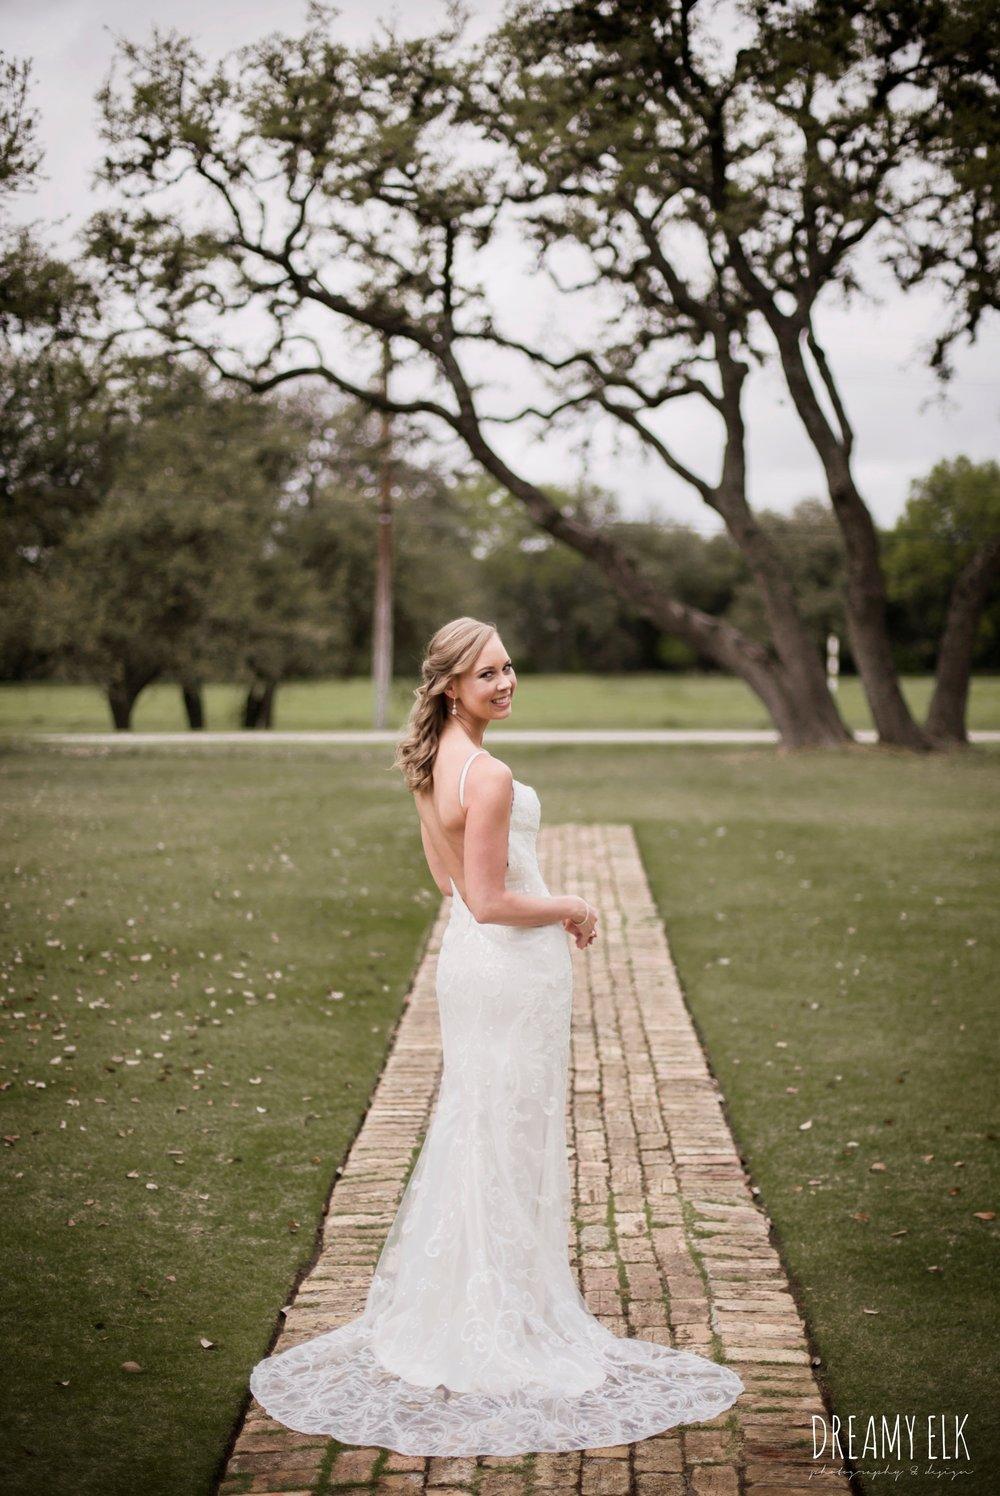 backless column sheath wedding dress, cloudy march wedding photo, canyon springs golf club wedding, san antonio, texas {dreamy elk photography and design}